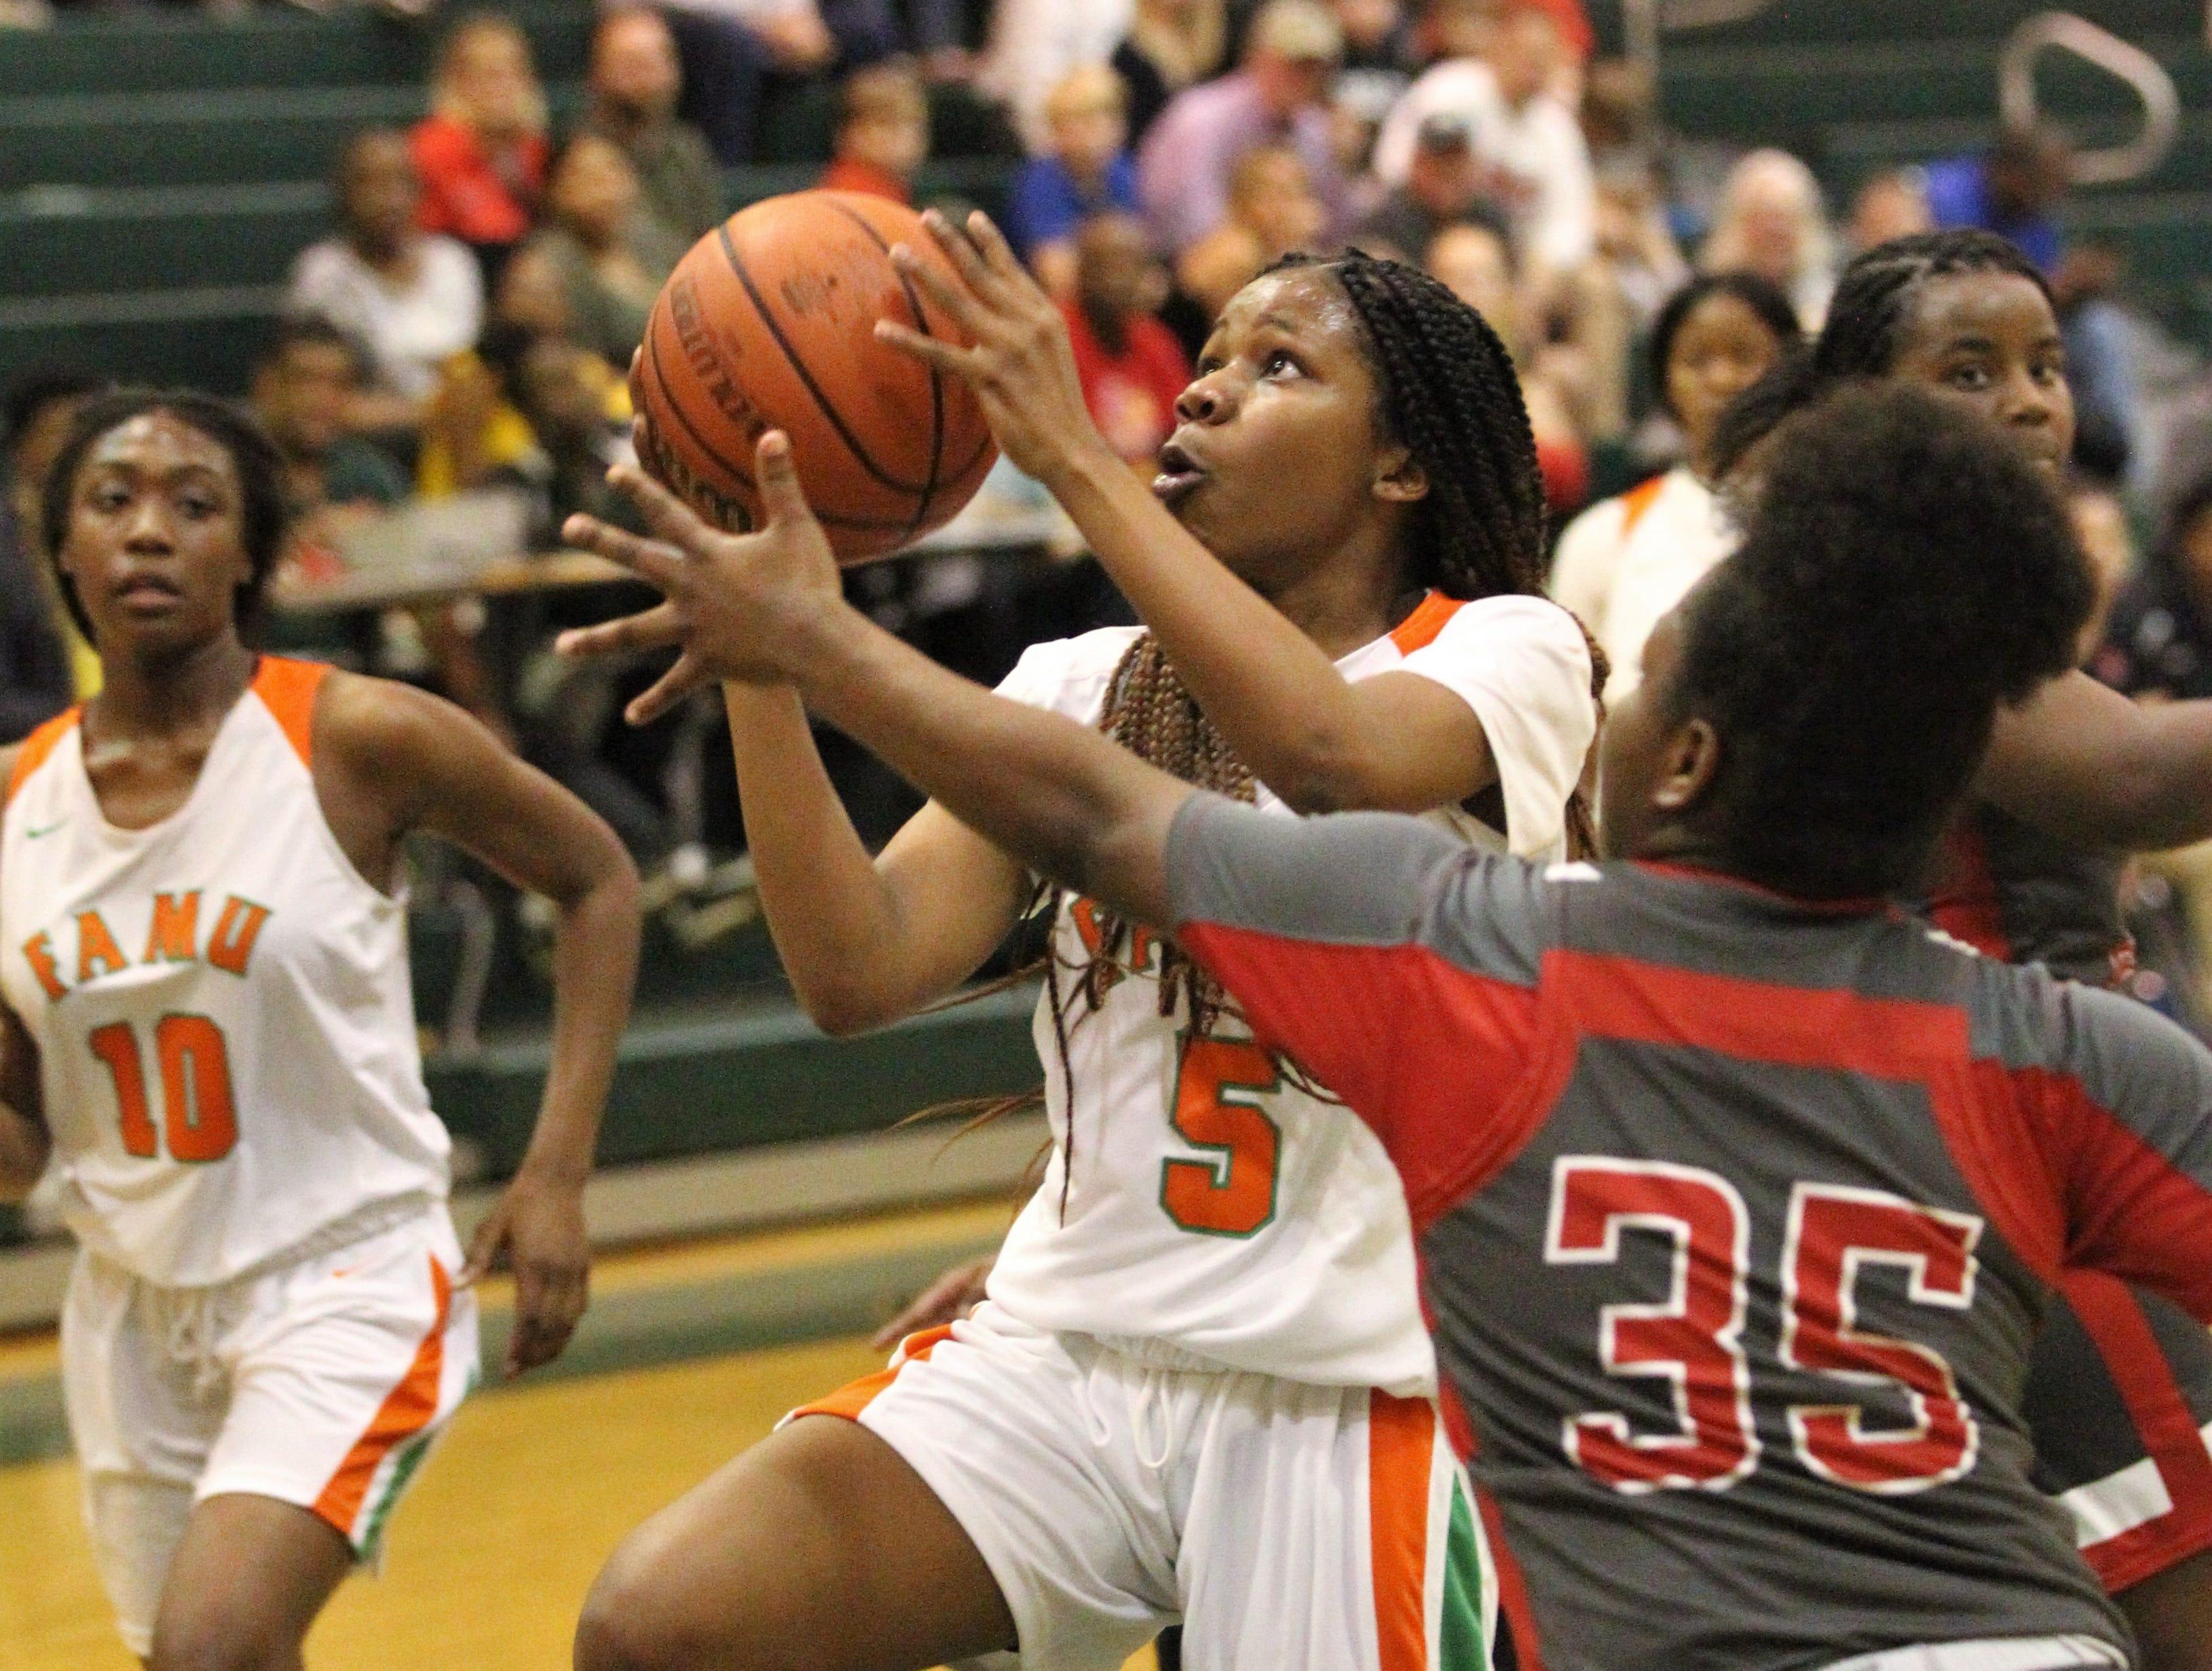 FAMU DRS freshman Alexandria Reddick drives for a layup as FAMU DRS' girls basketball team beat NFC 59-41 for a District 1-3A title on Jan. 7, 2019.